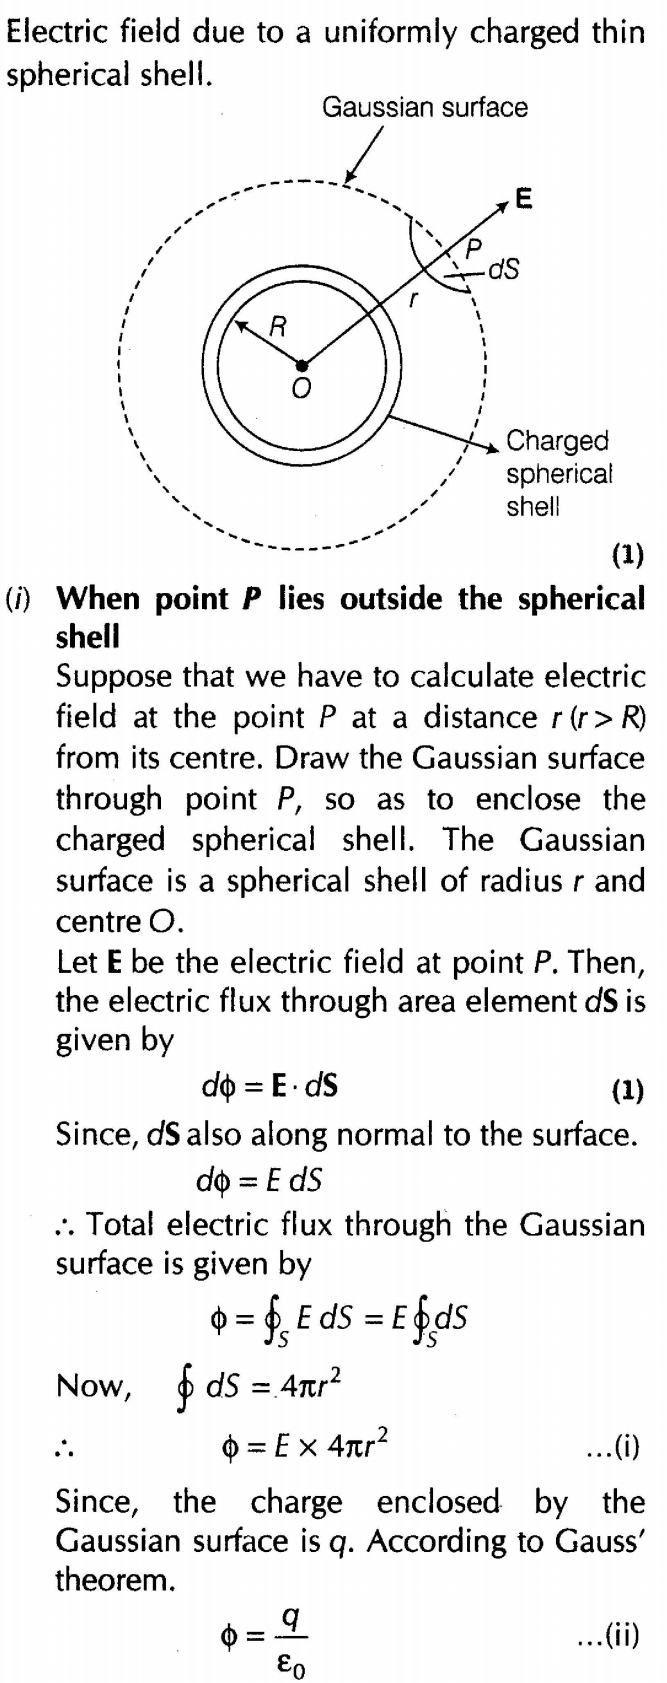 important-questions-for-class-12-physics-cbse-gausss-law-q-32jpg_Page1 #NCERT #NCERTsolutions #CBSE #CBSEclass12 #CBSEclass12Physics